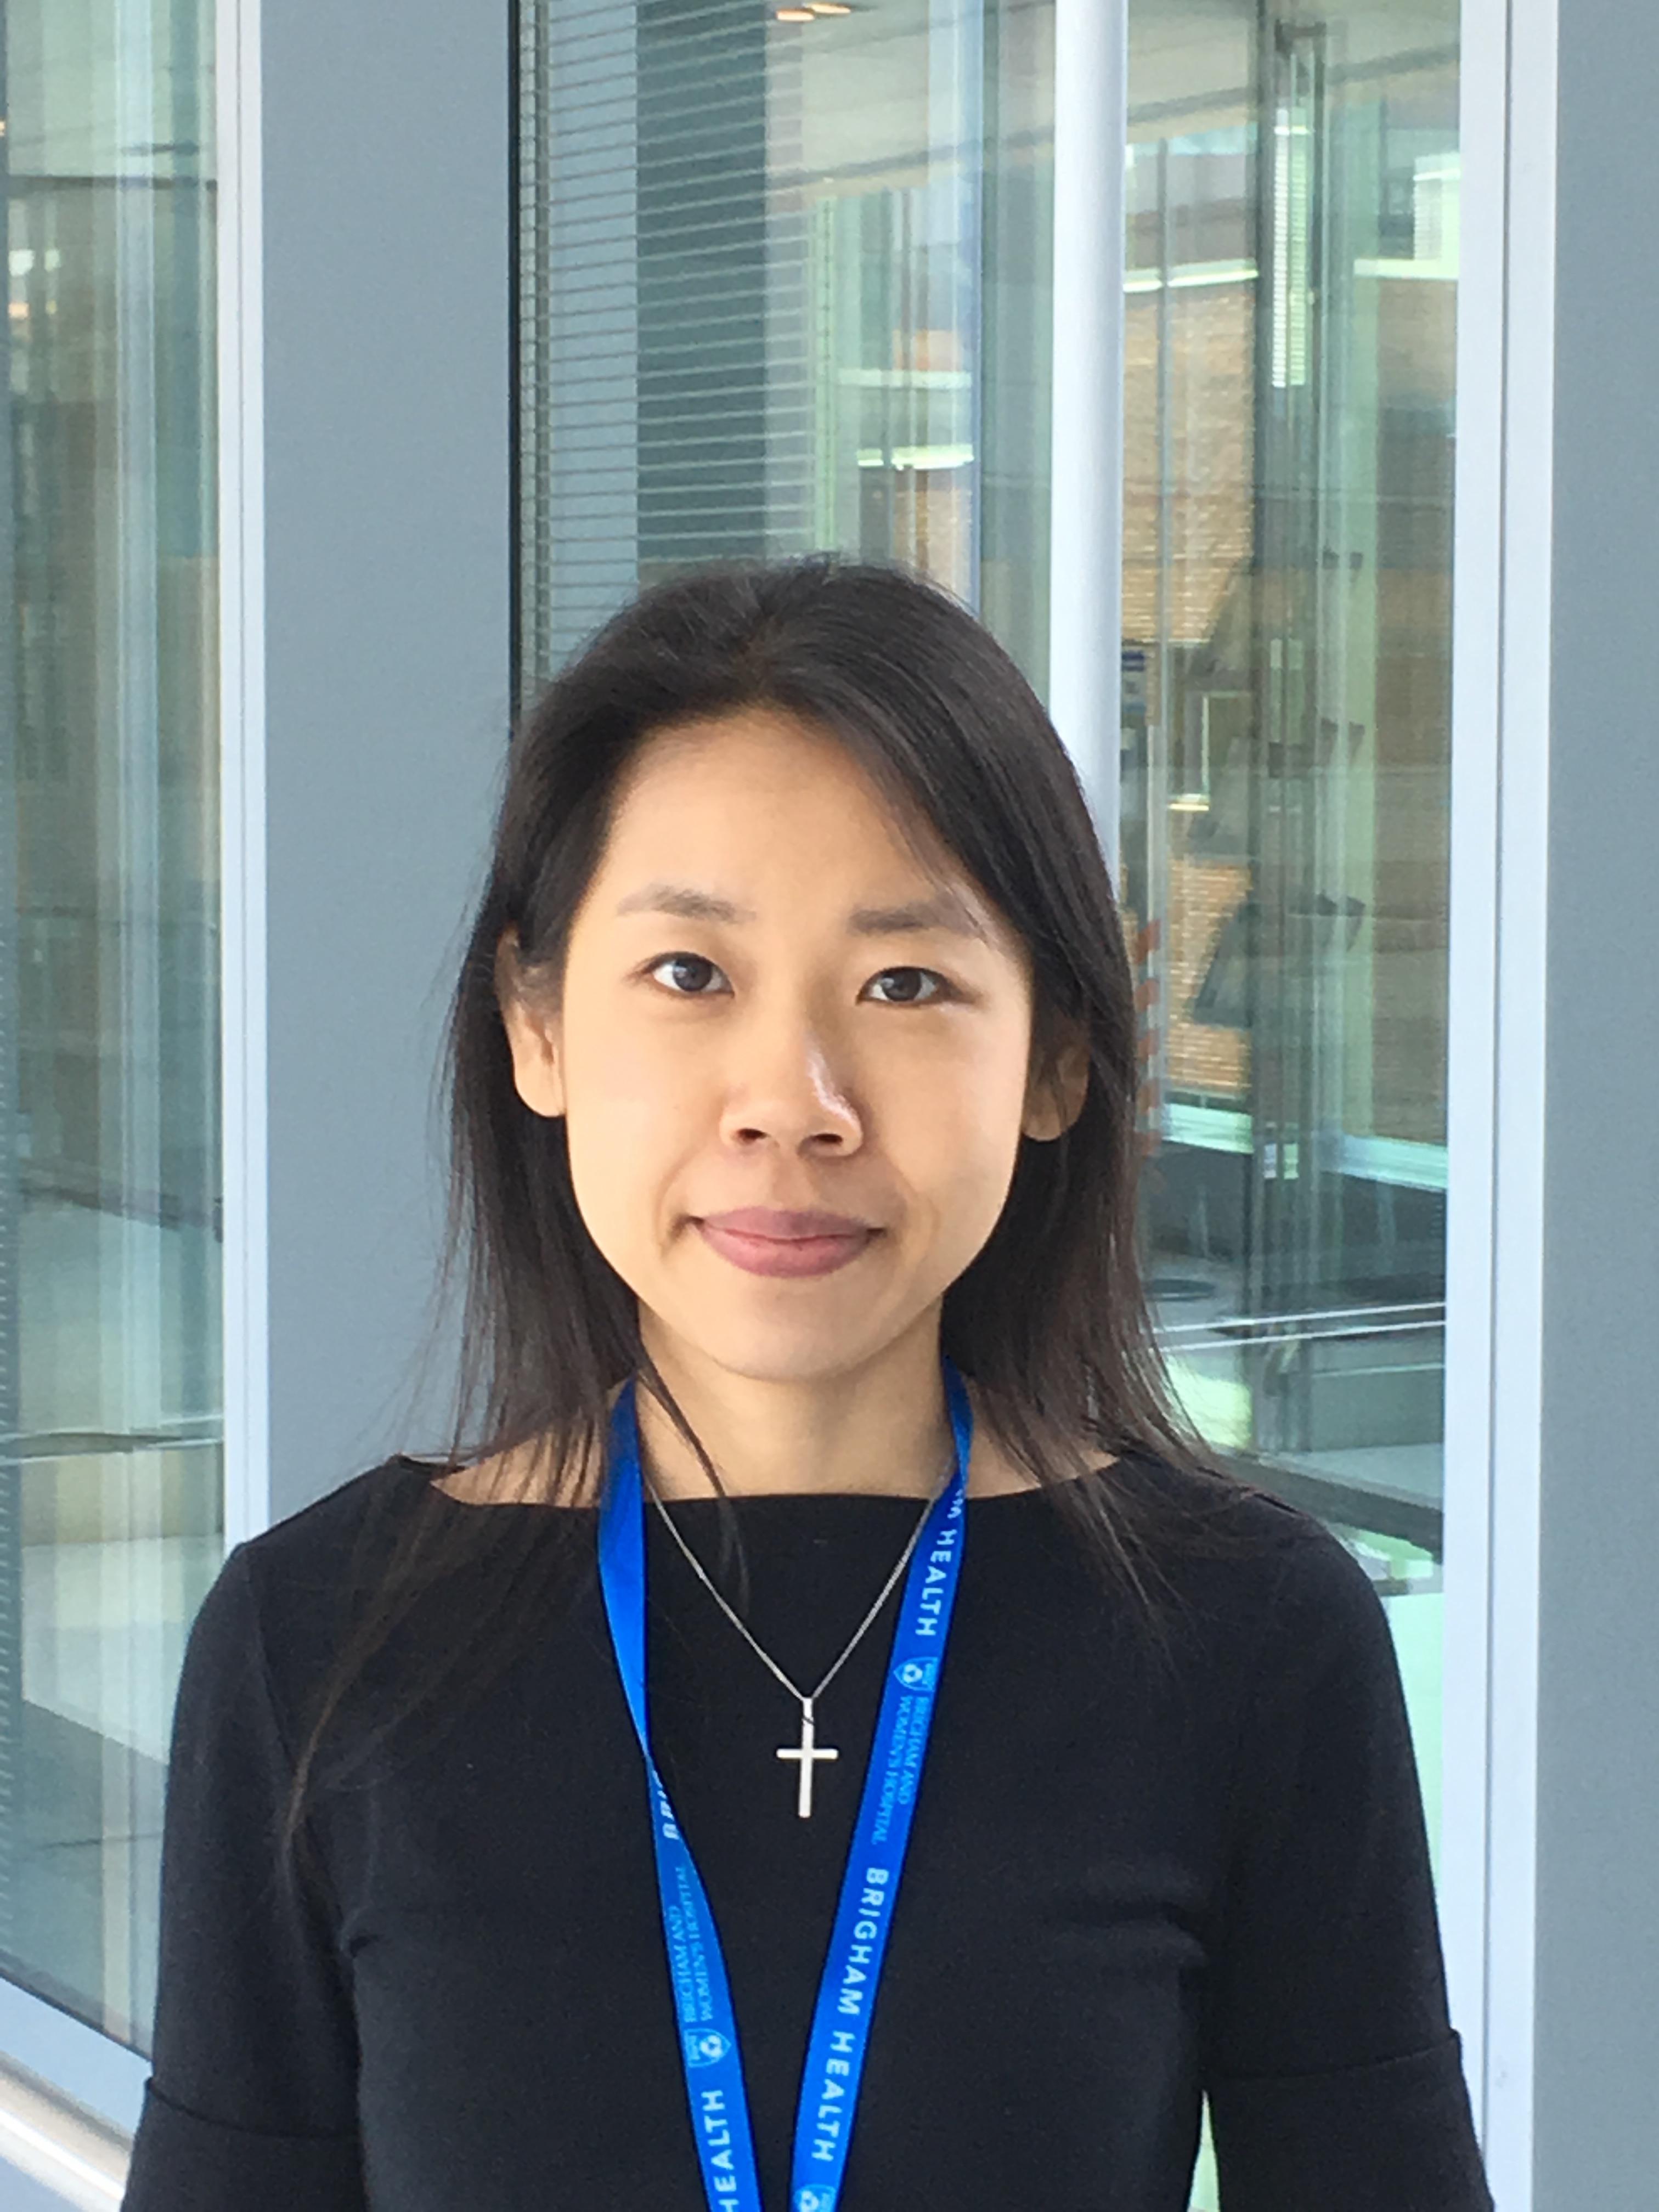 Amber Xue, M.S. profile